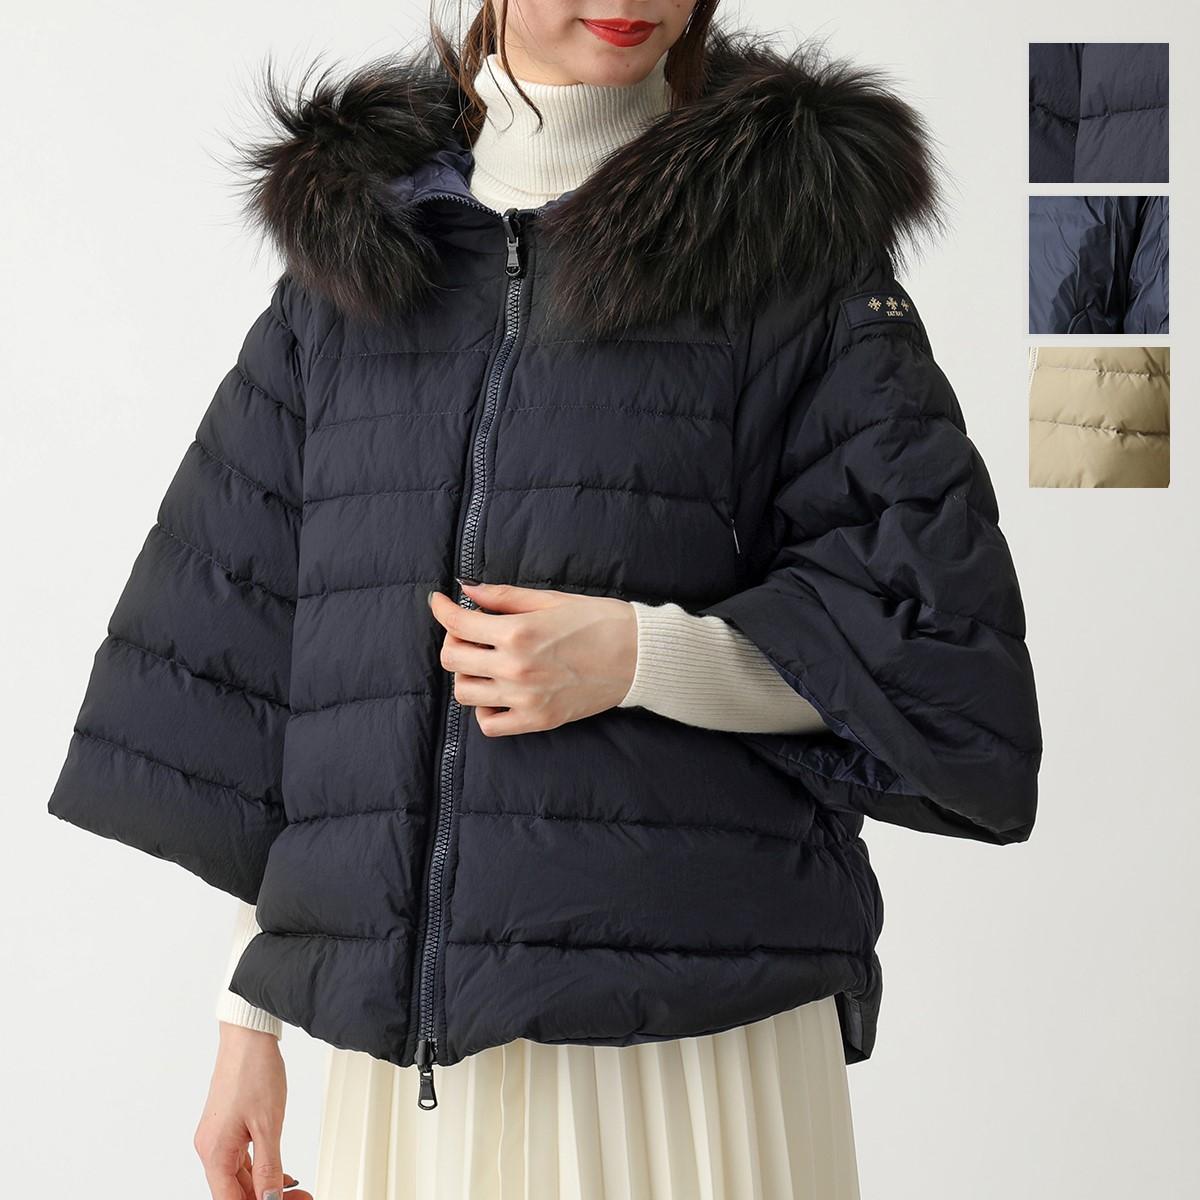 TATRAS タトラス LTA19A4692 MALE ラクーンファー装飾 リバーシブルダウンジャケット NAVY